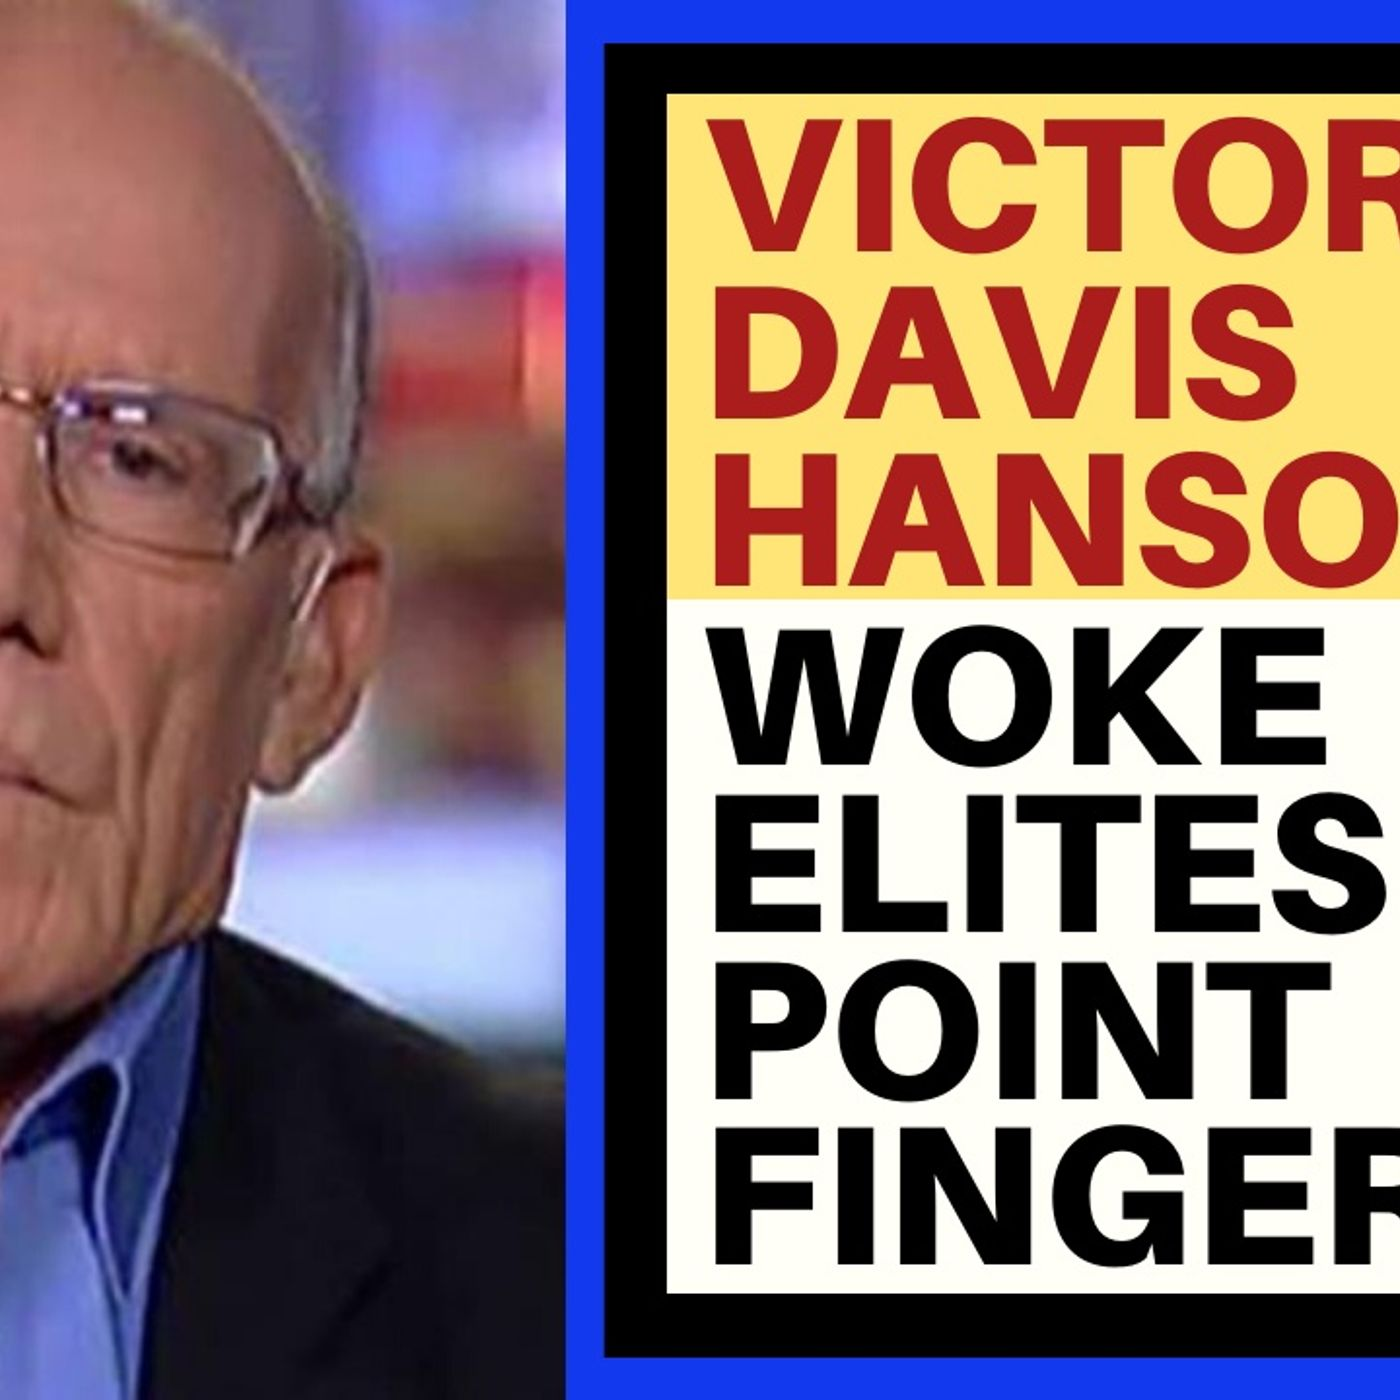 VICTOR DAVIS HANSON ON WOKE ELITES POINTING FINGERS